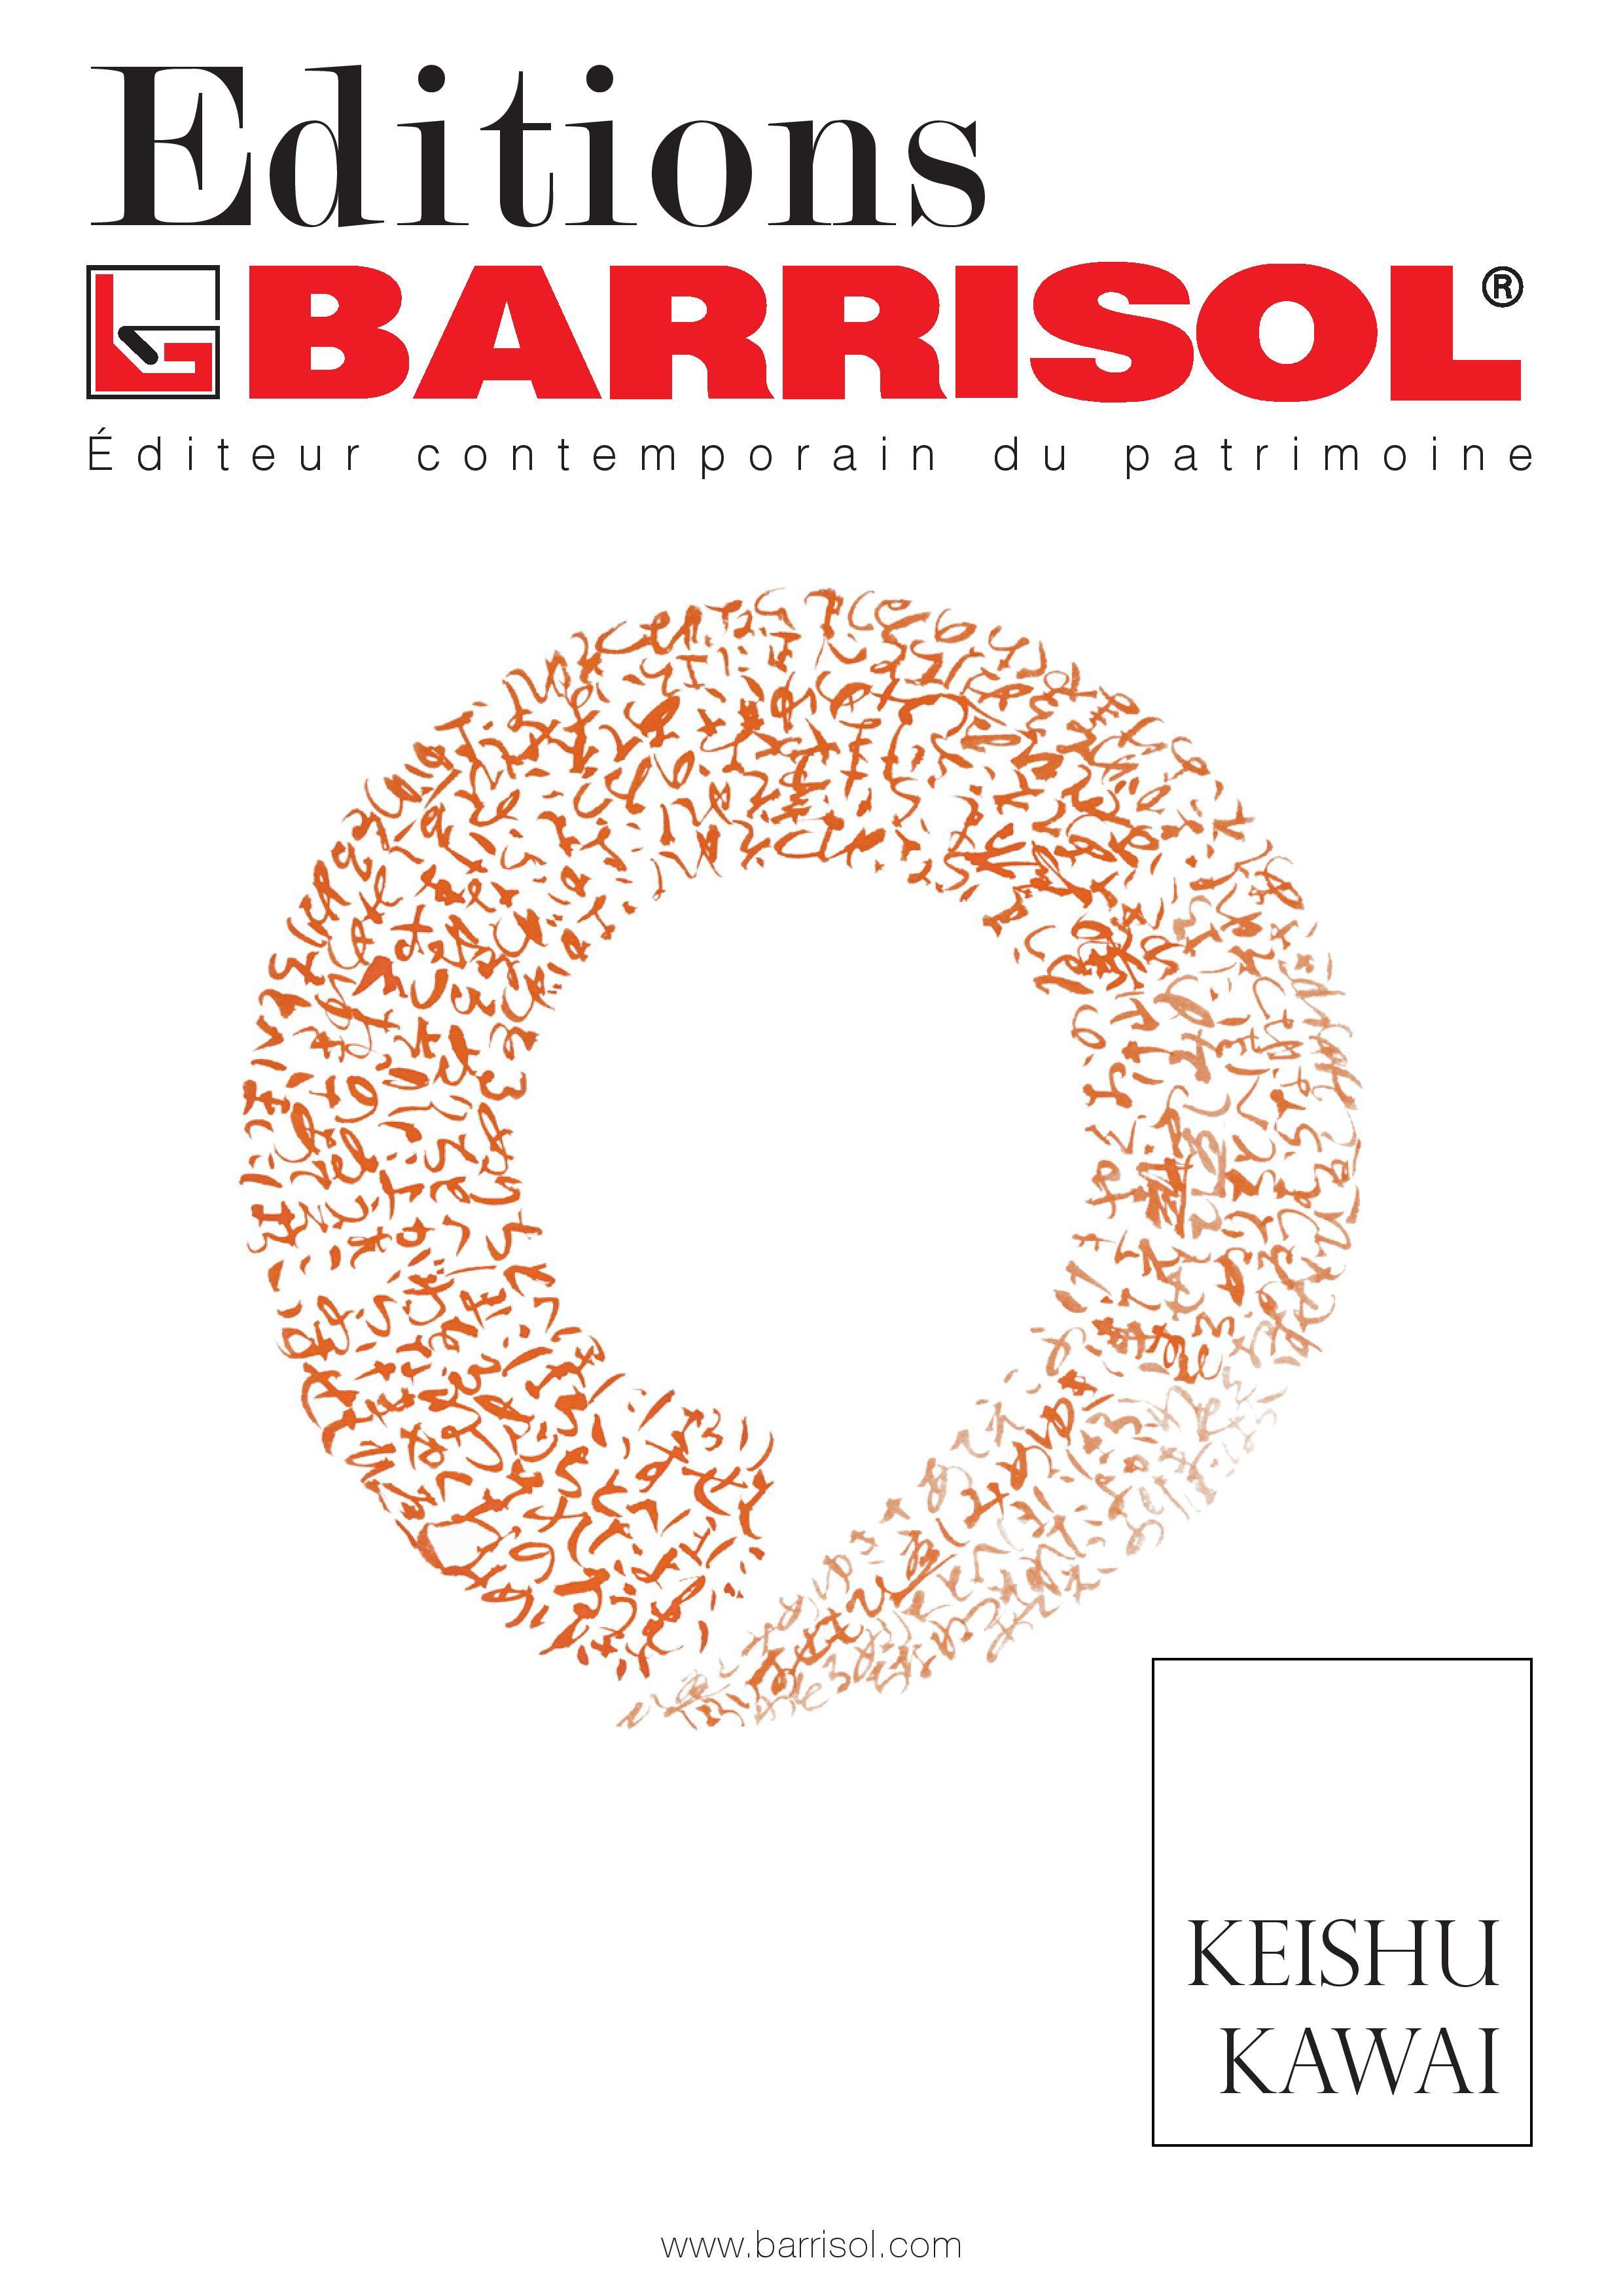 Editions BARRISOL - Dépliant Keishu Kawai